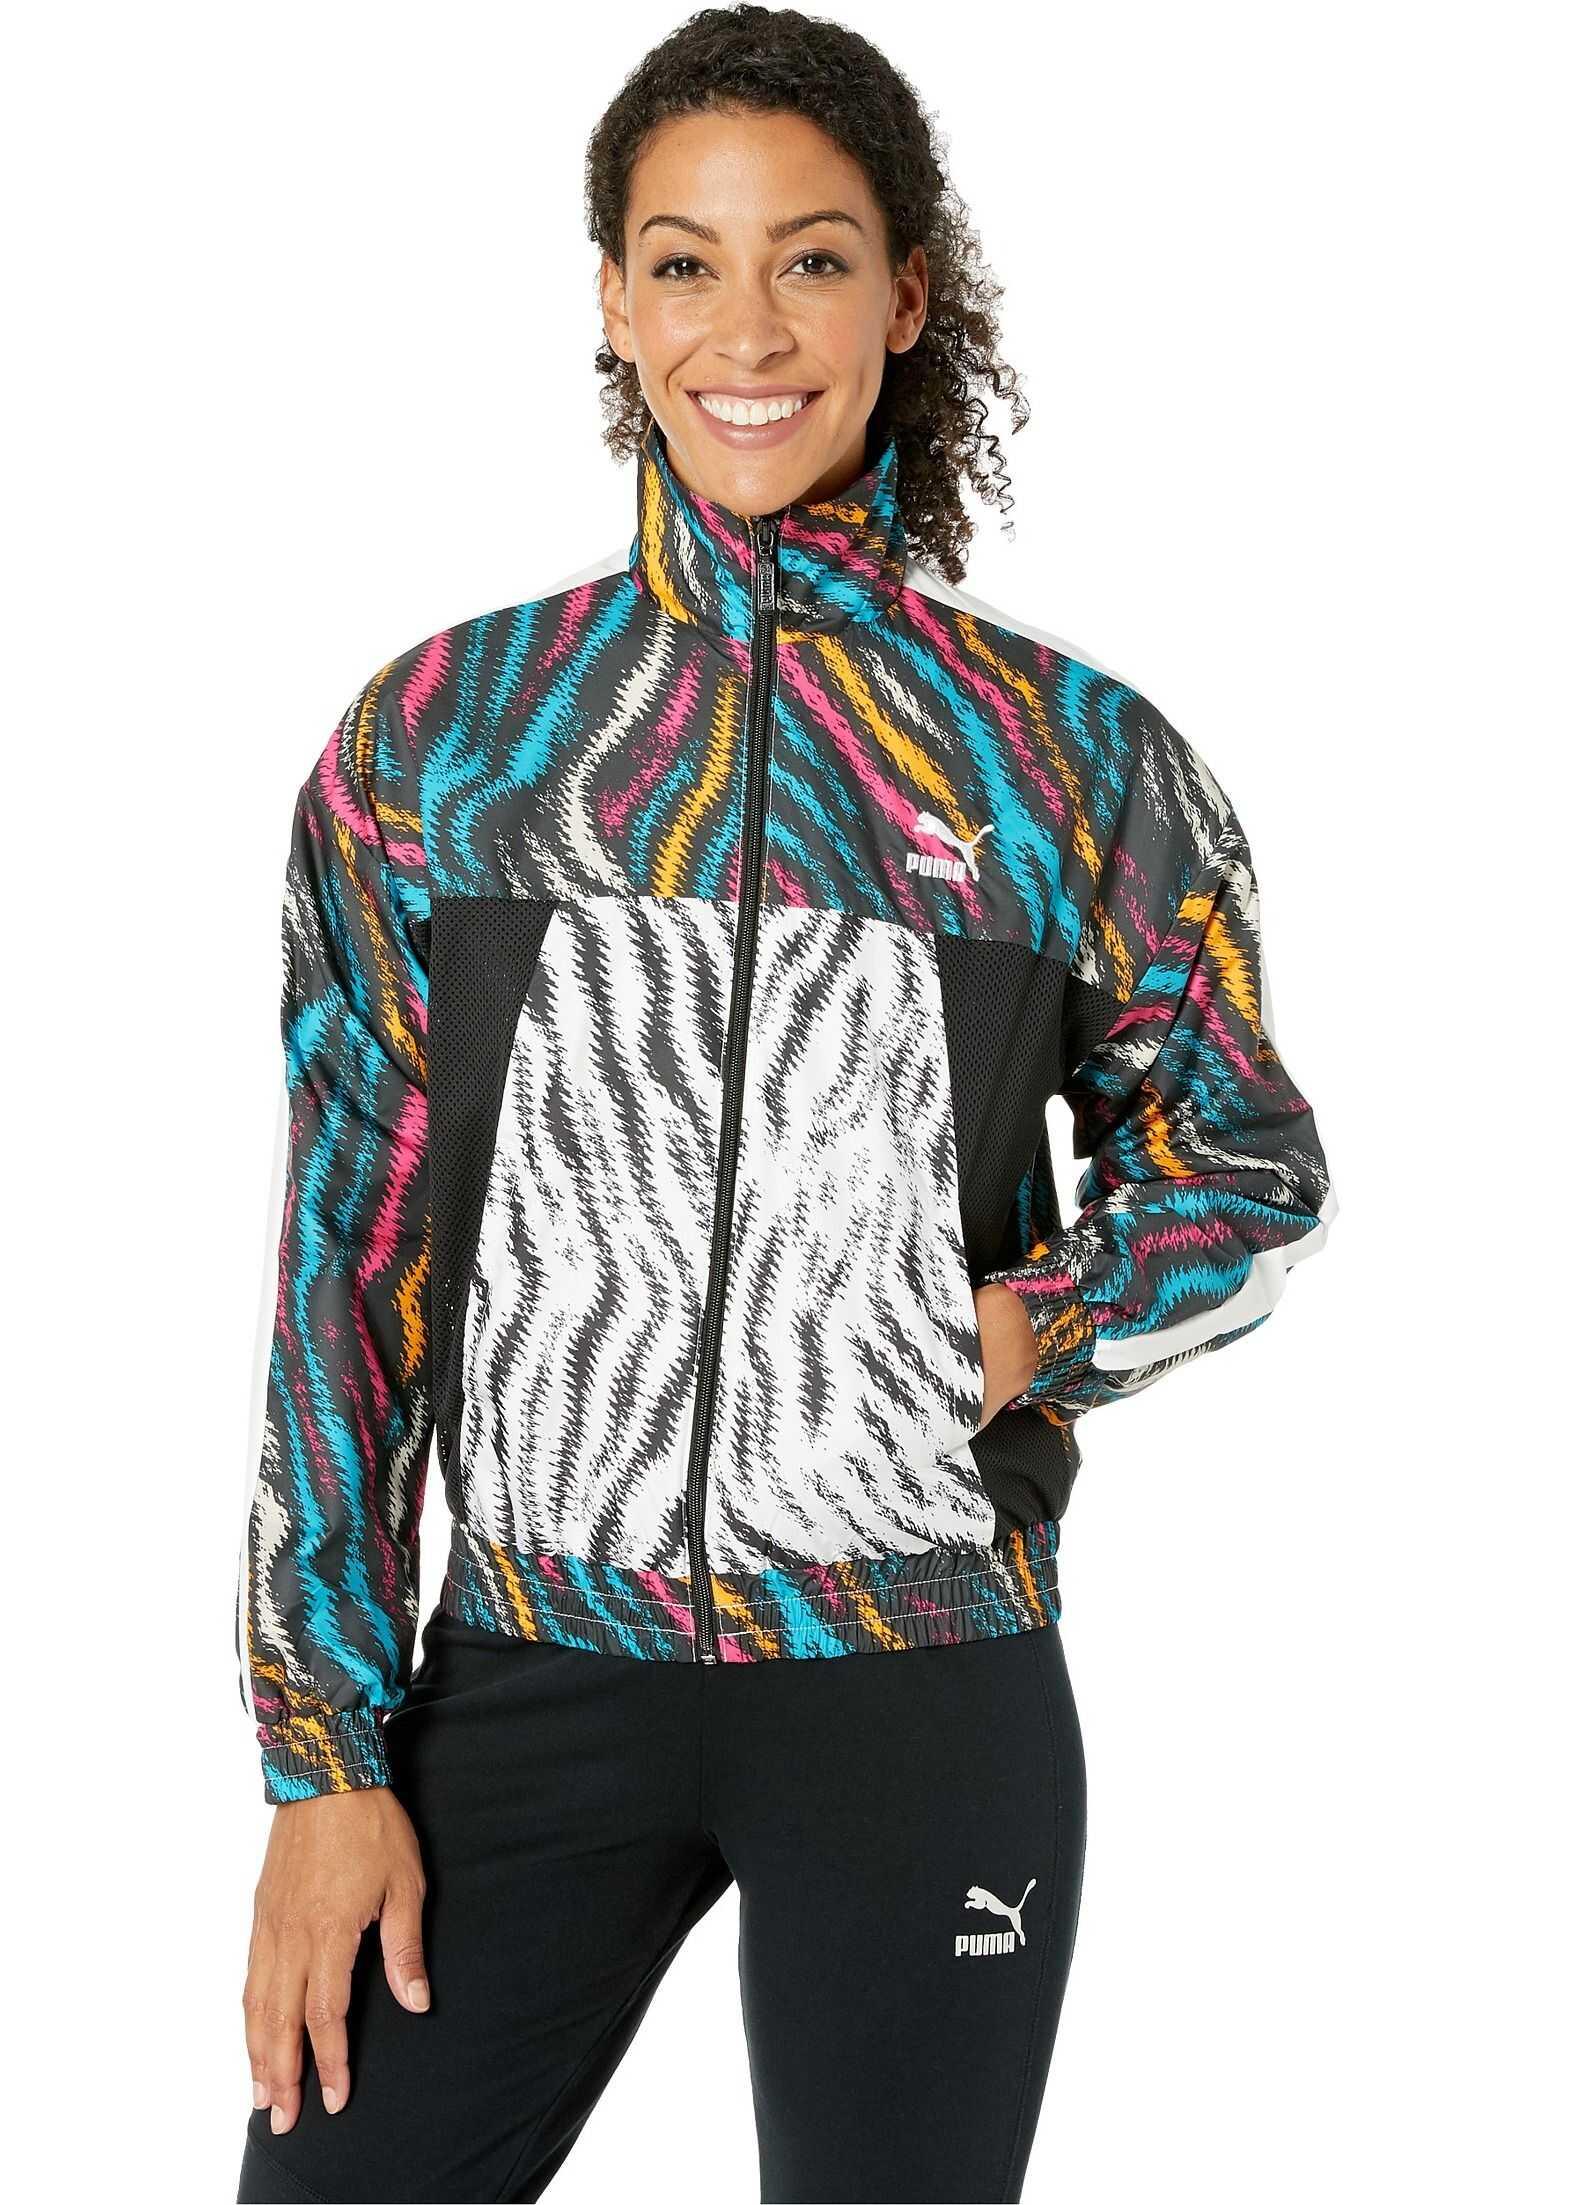 PUMA Wild Pack Cropped Jacket Puma Black/Colour/Zebra